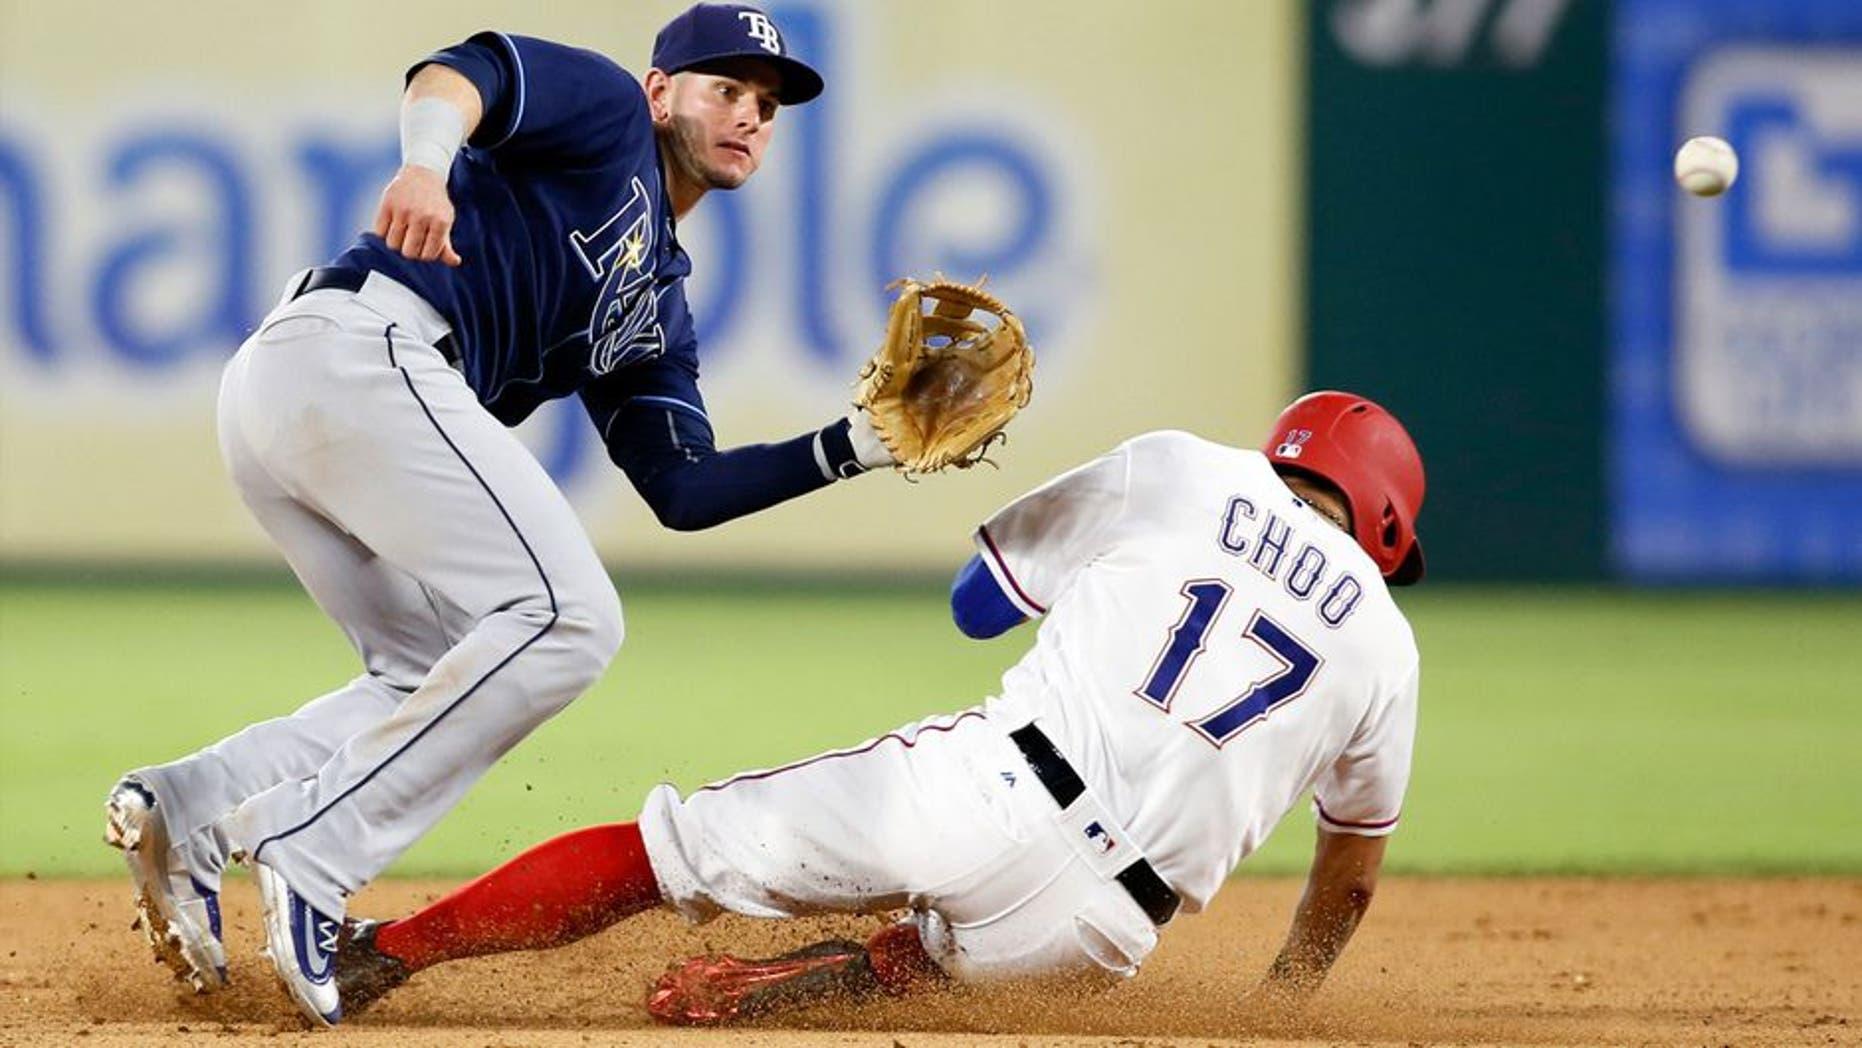 Texas Rangers designated hitter Shin-Soo Choo (17) steals second base against Tampa Bay Rays second baseman Daniel Robertson (29) in the seventh inning at Globe Life Park in Arlington. Mandatory Credit: Tim Heitman-USA TODAY Sports